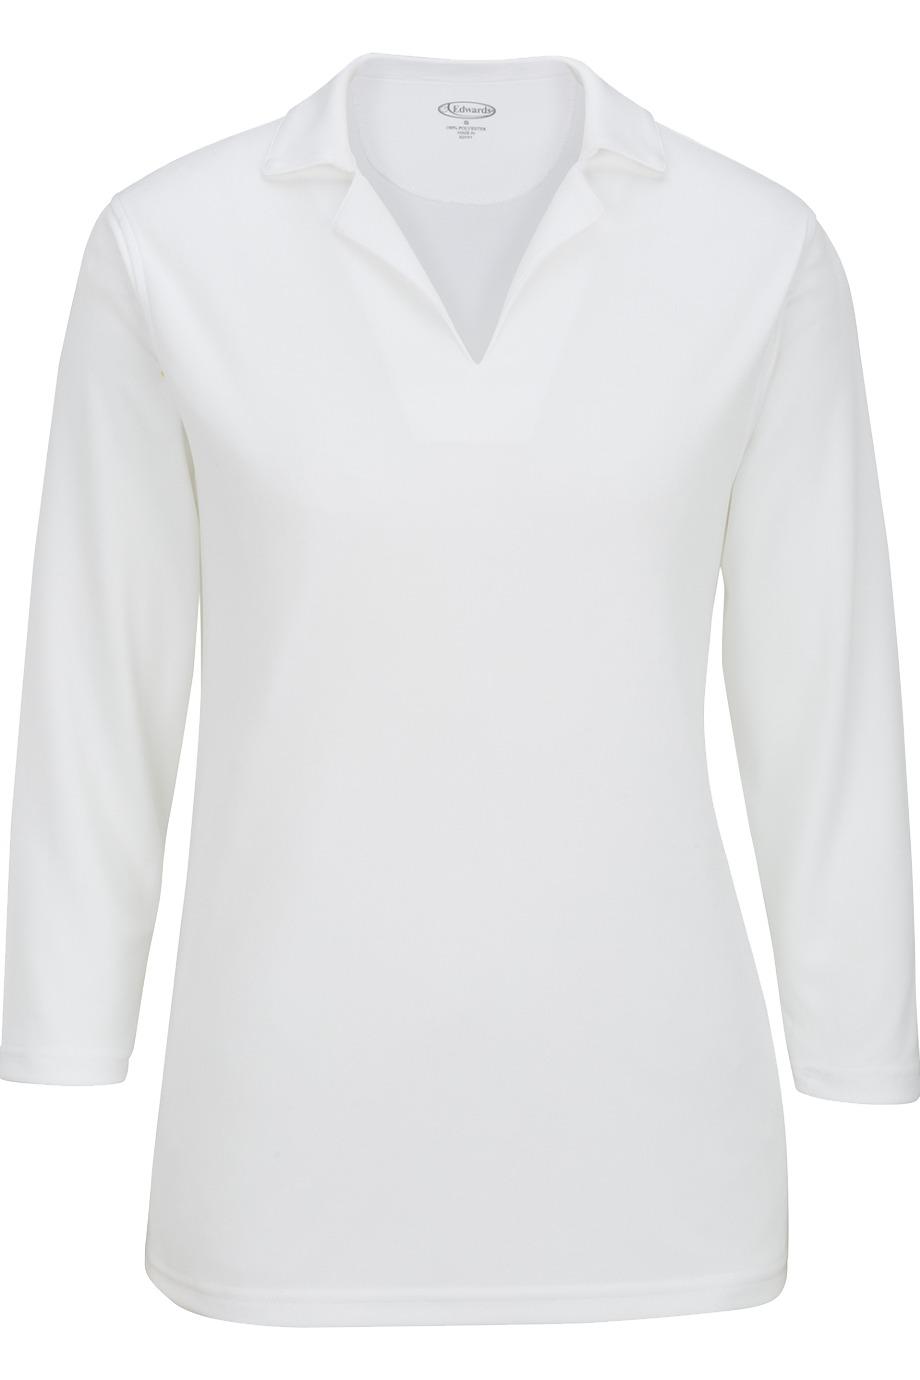 Edwards Garment 5581 - Ladies' 3/4 Sleeve Flat-Knit